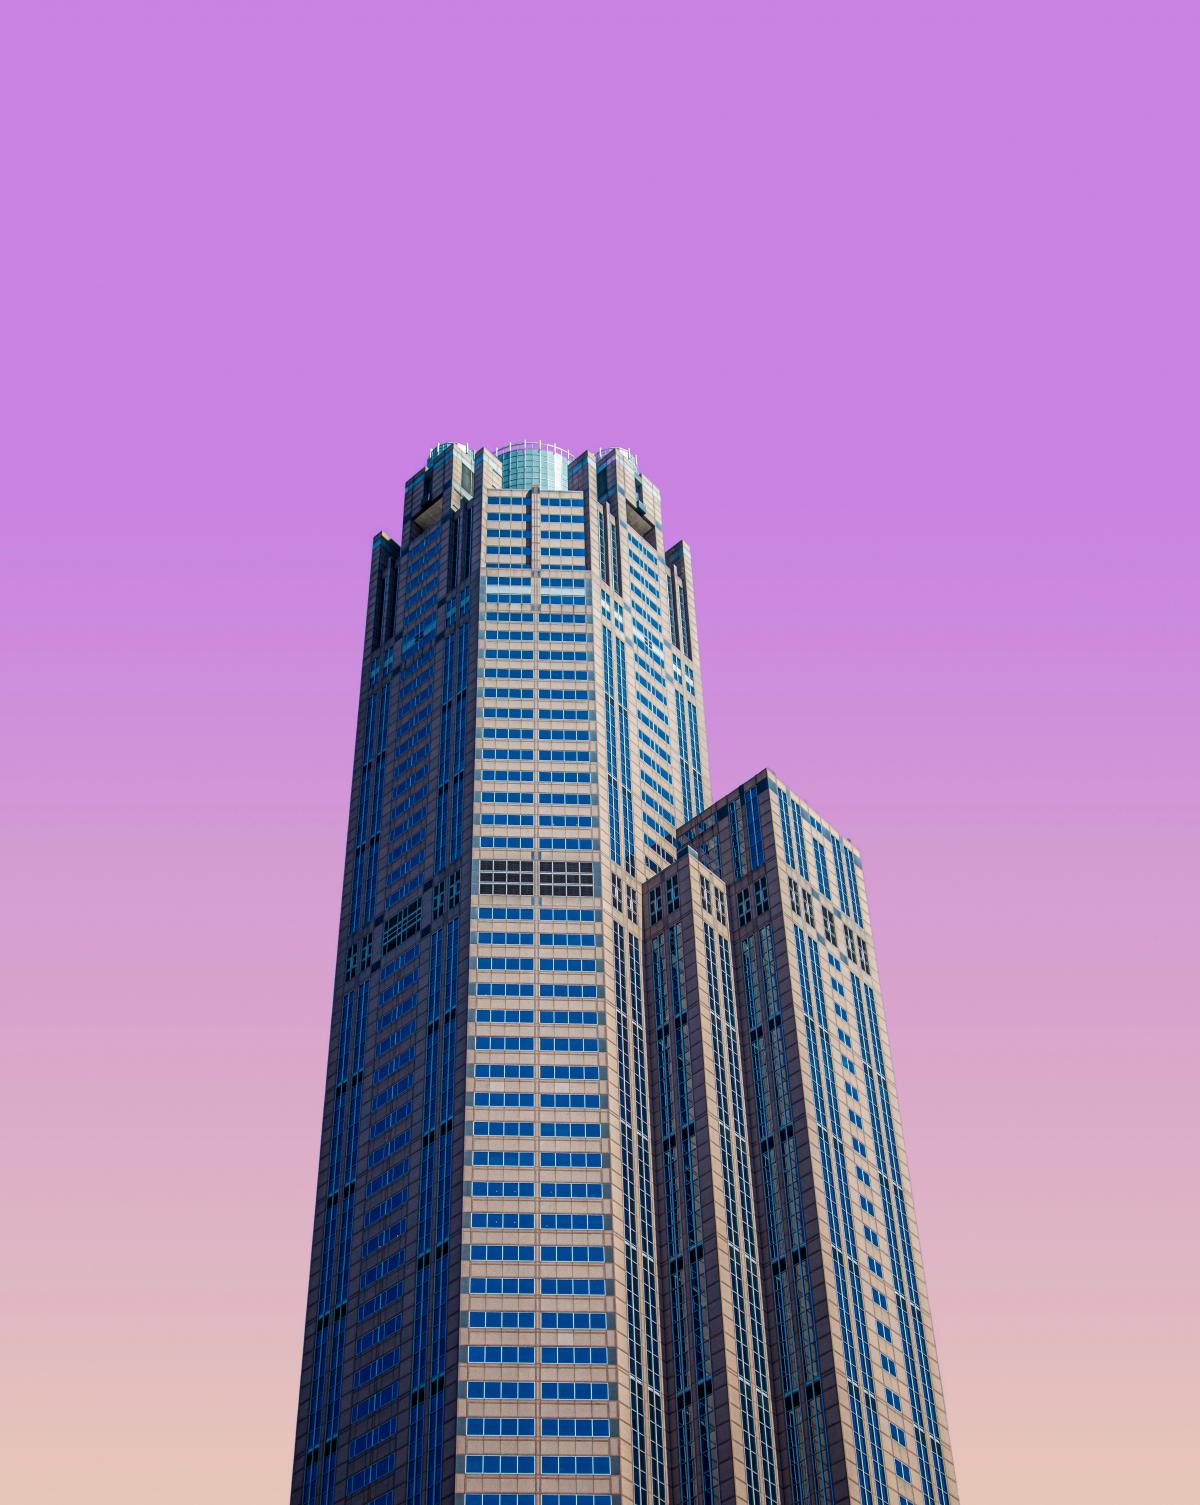 Skyscraper City Building